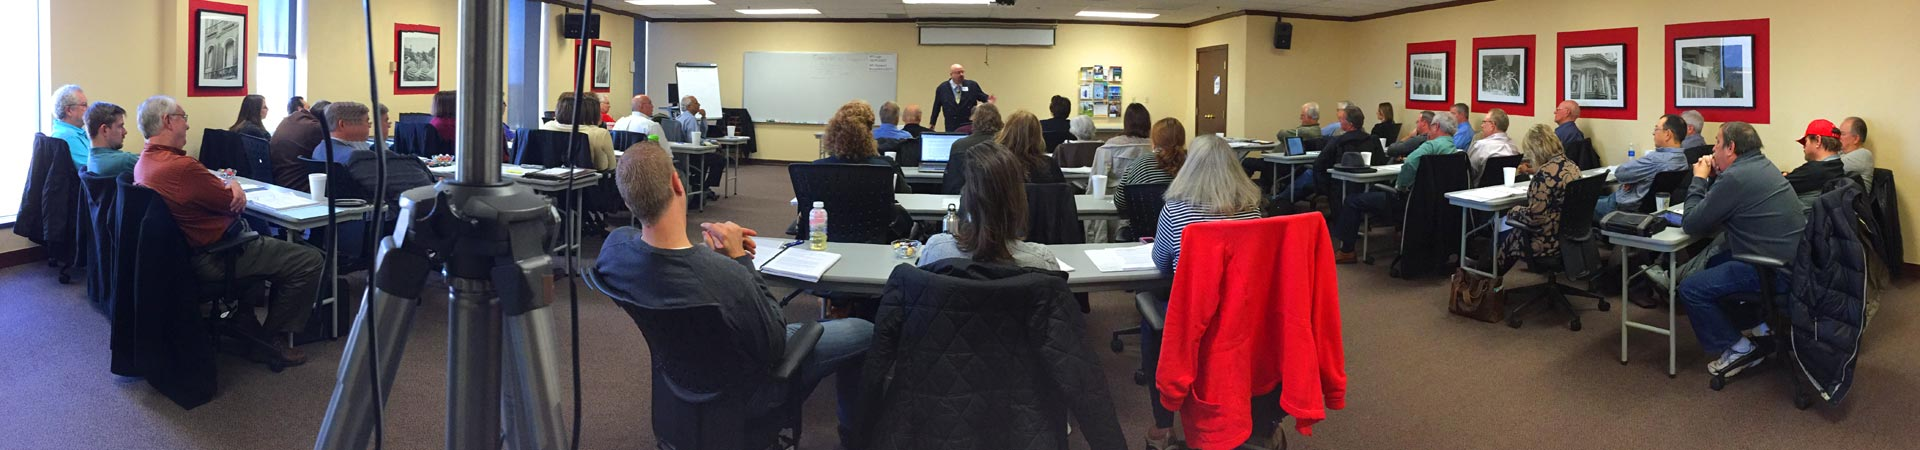 classroom-seminar